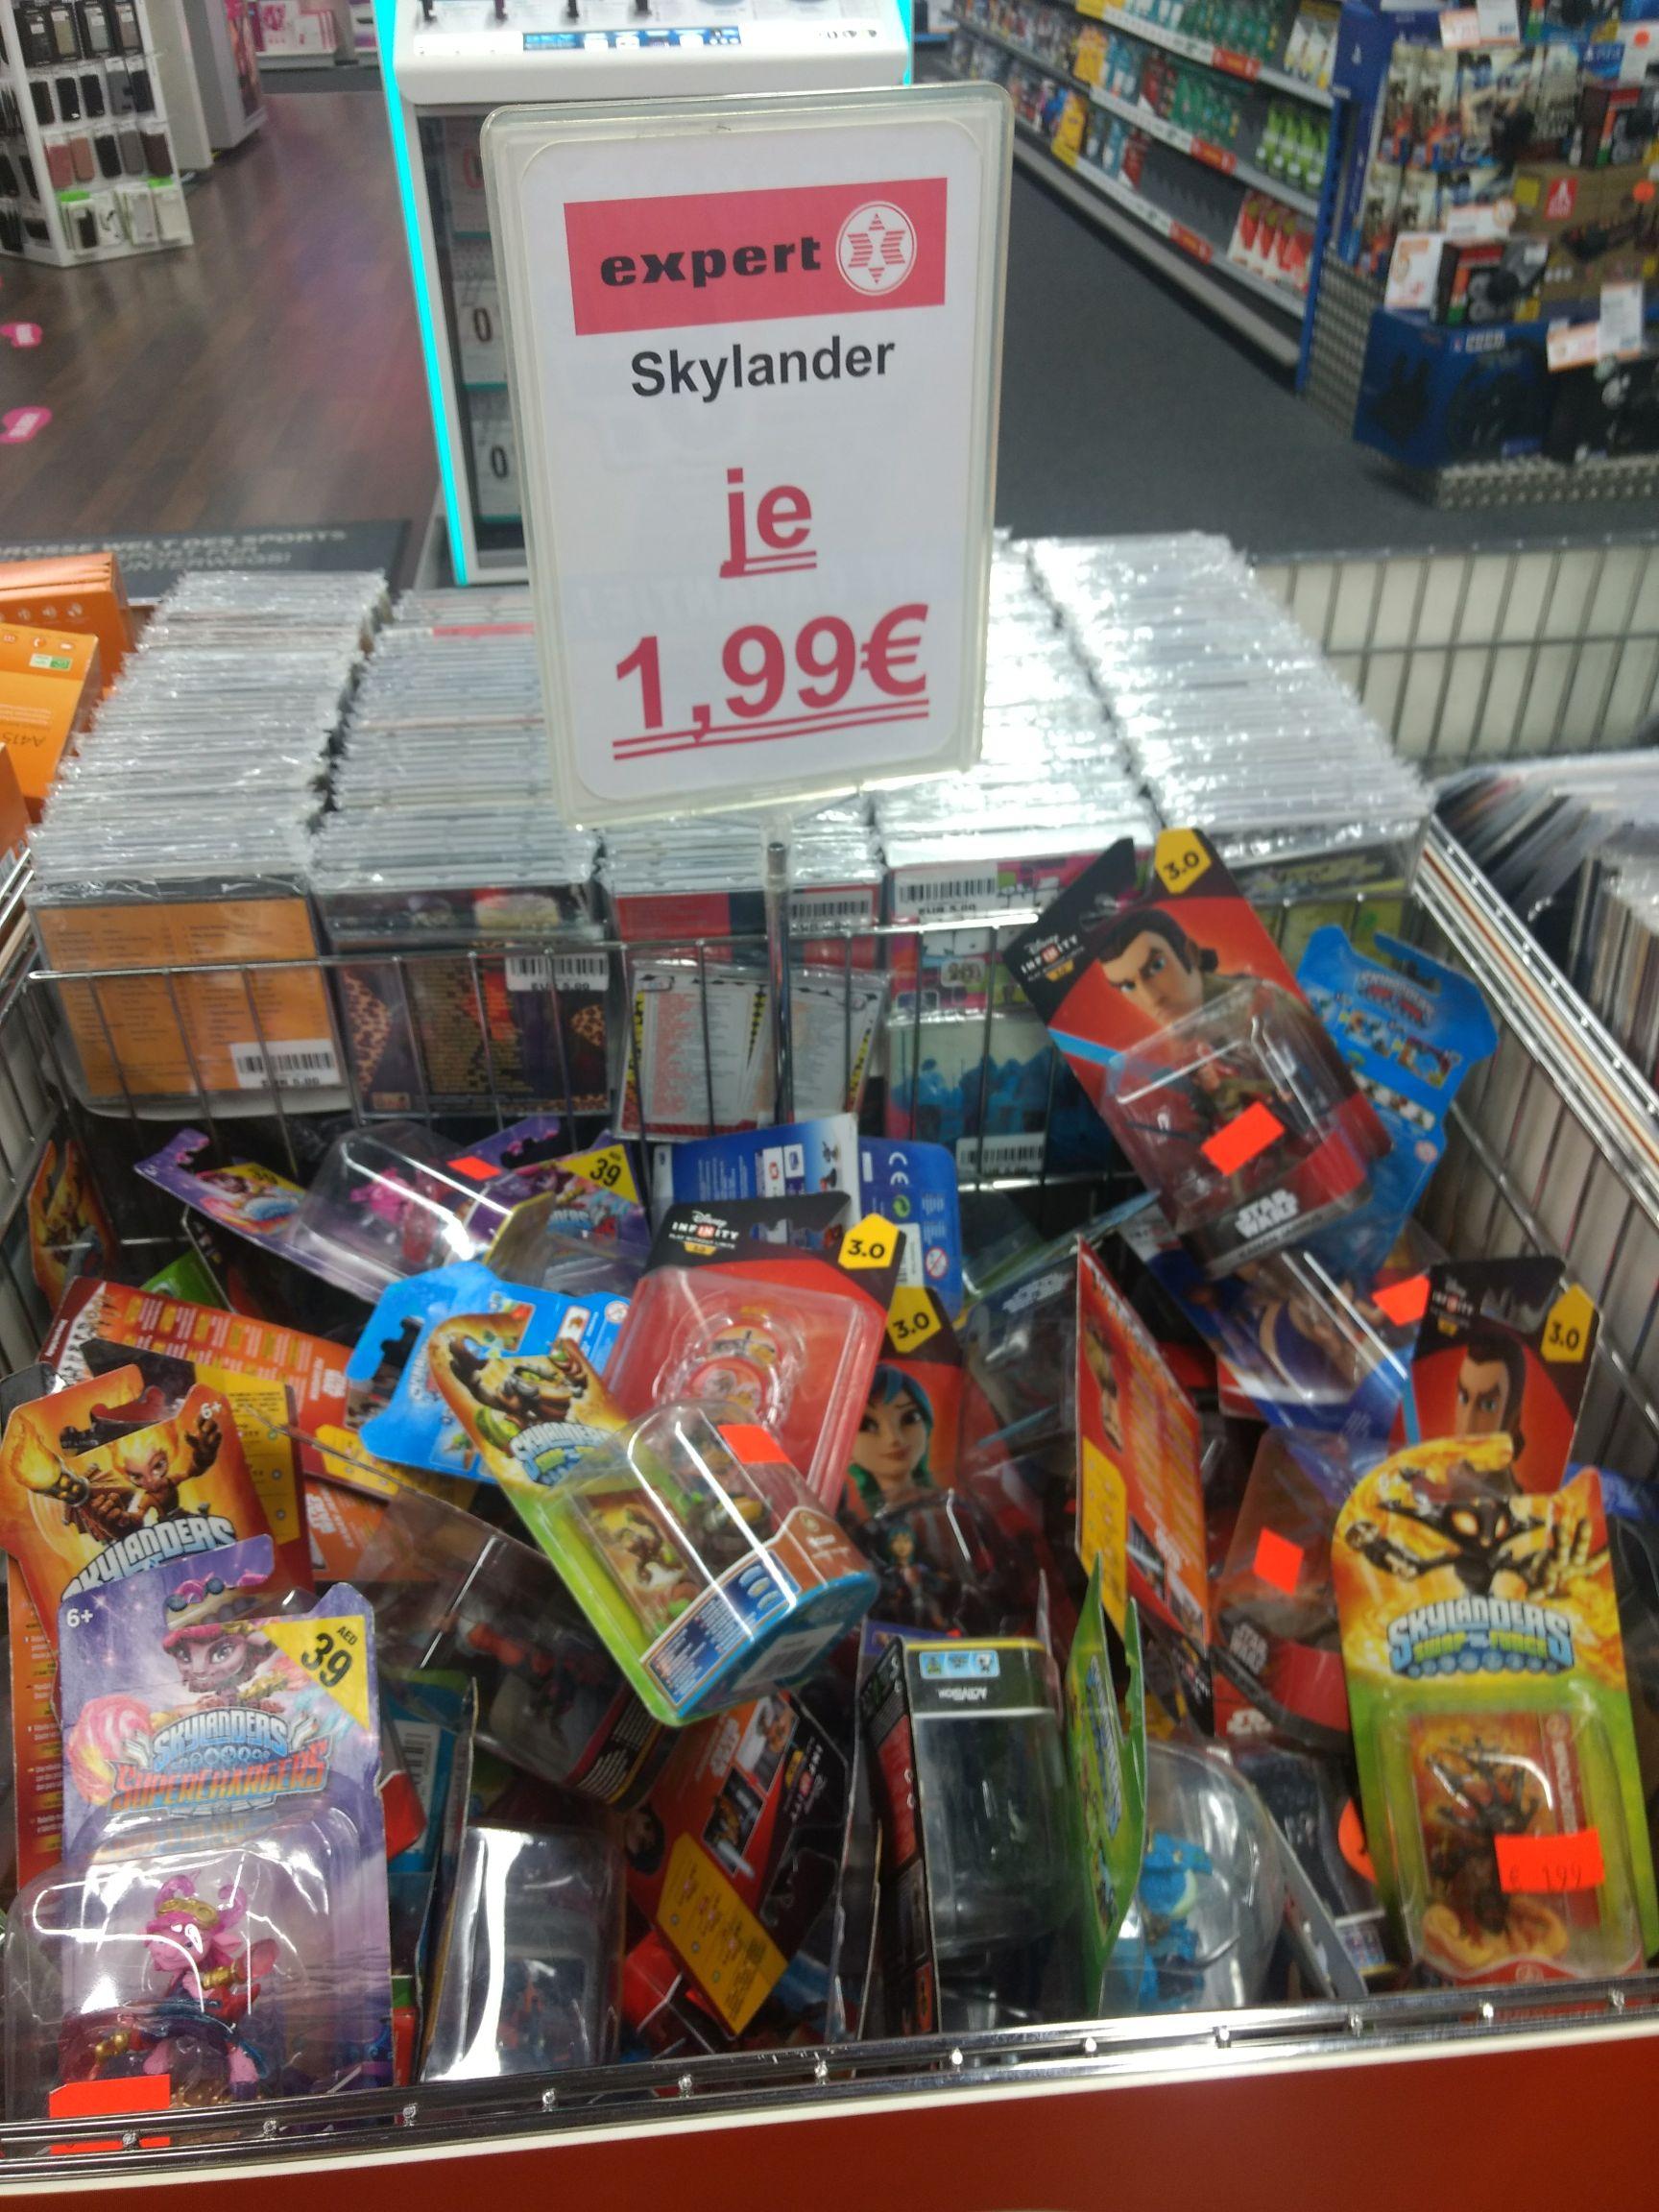 Skylanders Figuren für 1,99€ (Lokal Expert Ibbenbüren)